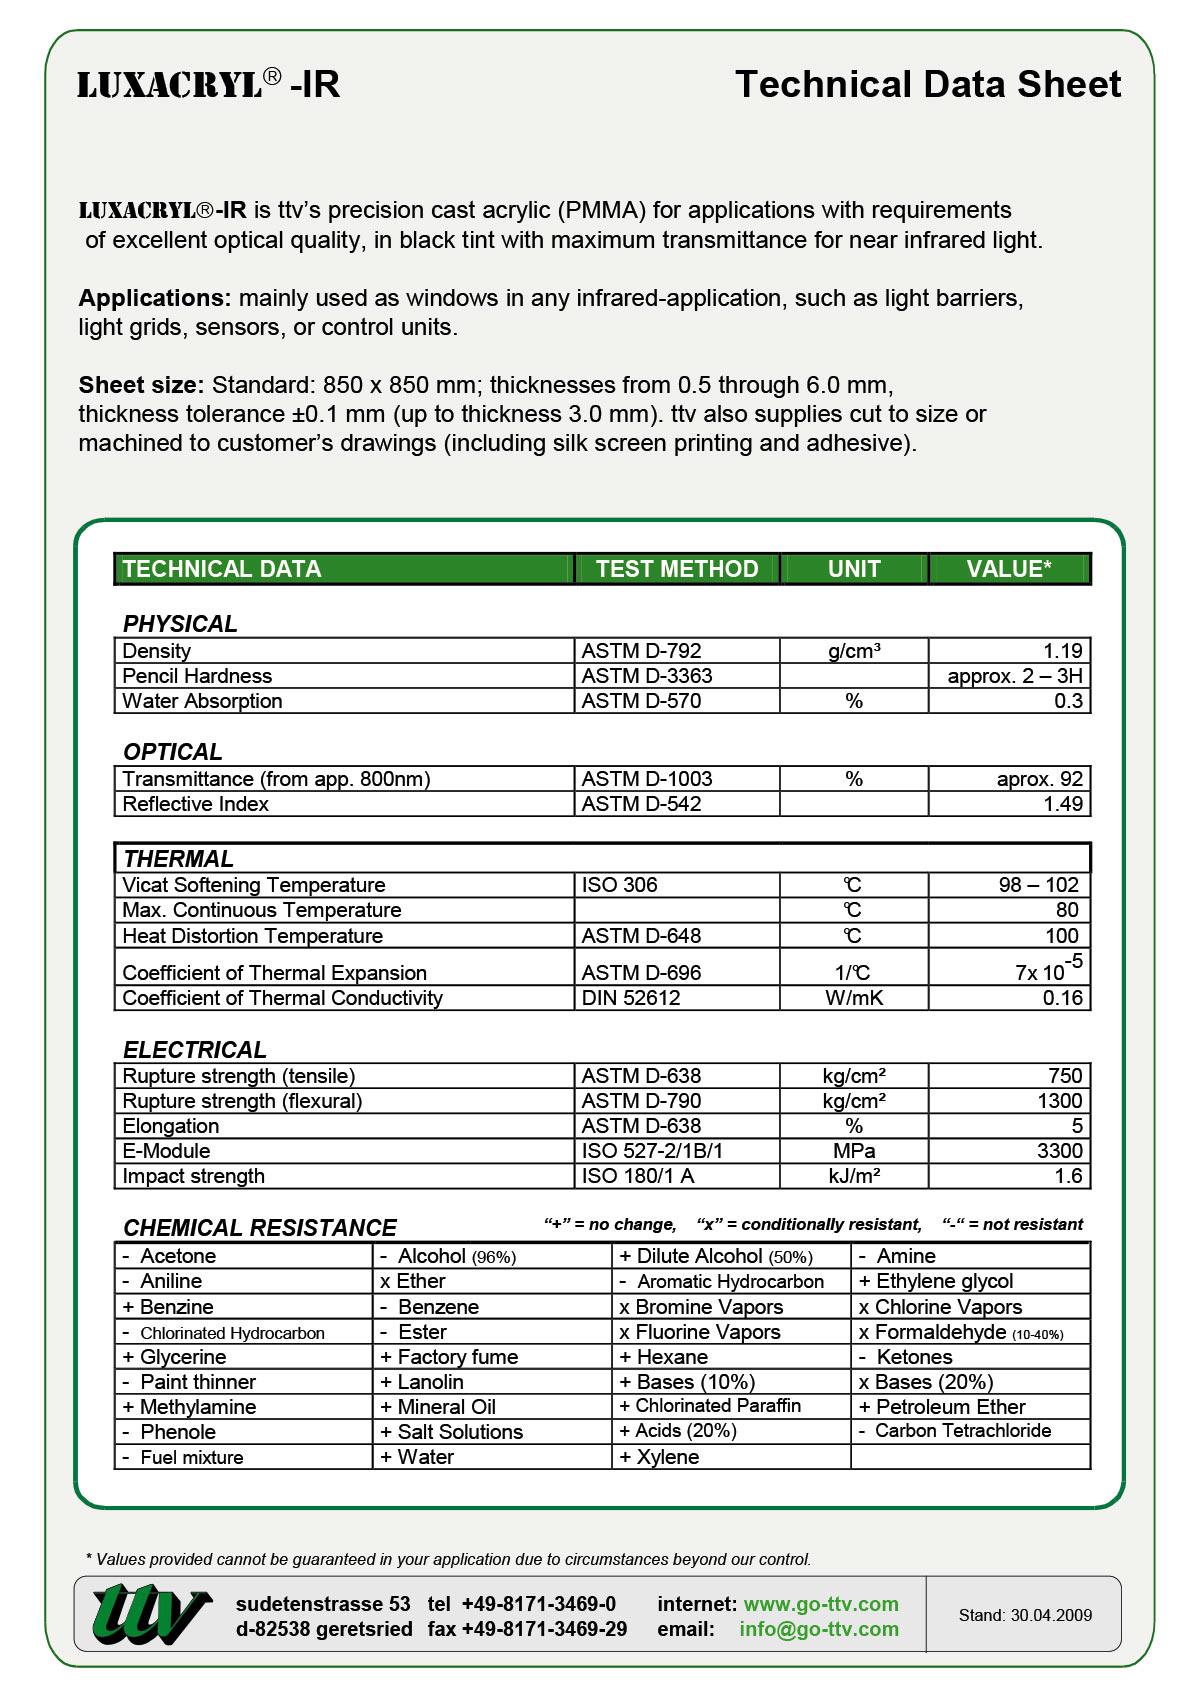 Luxacryl-IR Data sheet